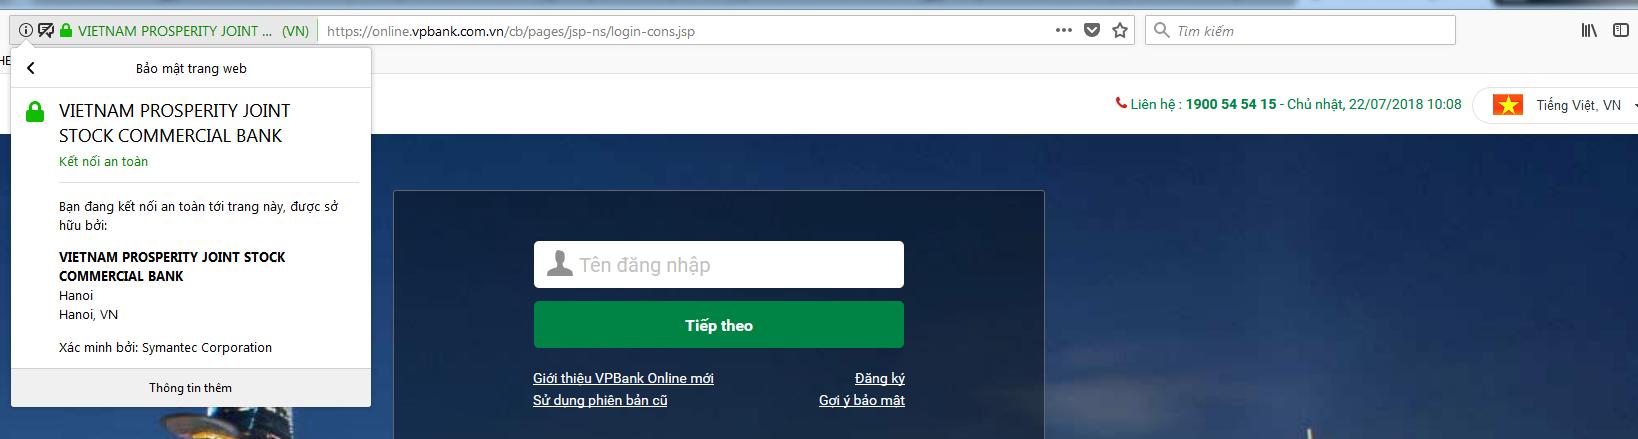 login_vpbank.png